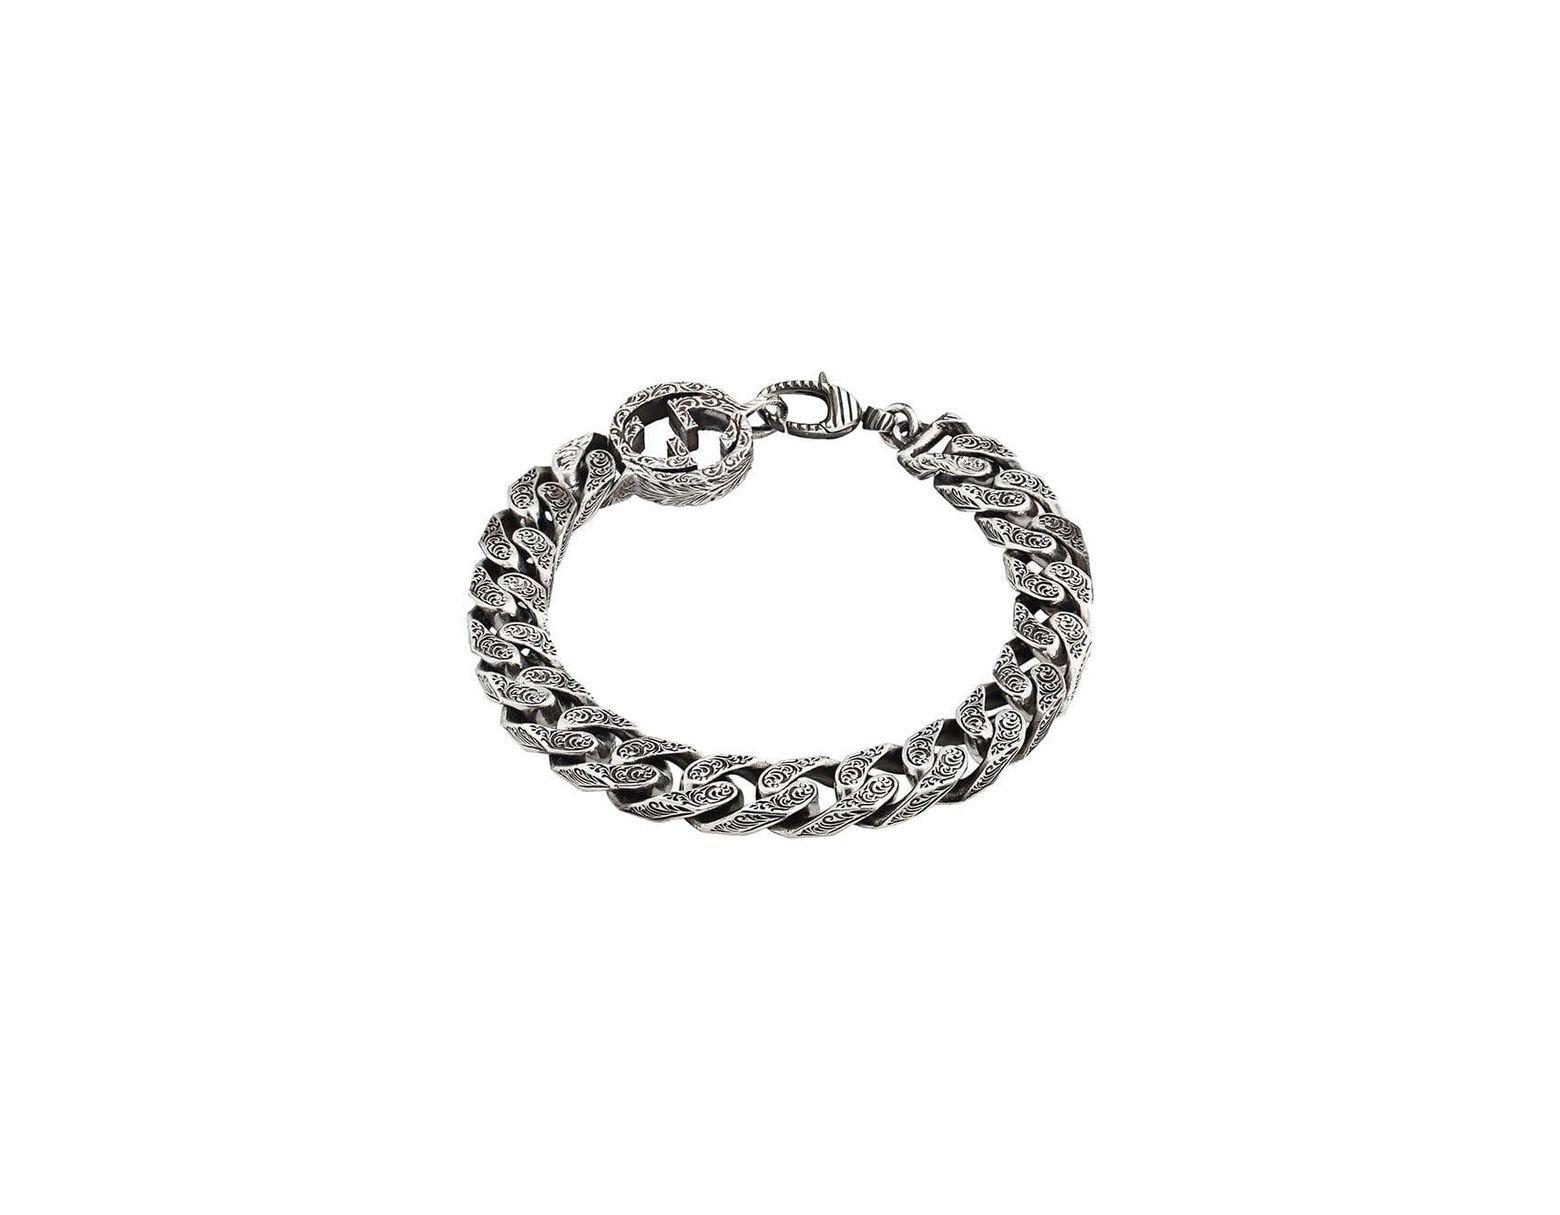 766776bcb Gucci Interlocking G Chain Bracelet In Silver in Metallic for Men - Save 5%  - Lyst